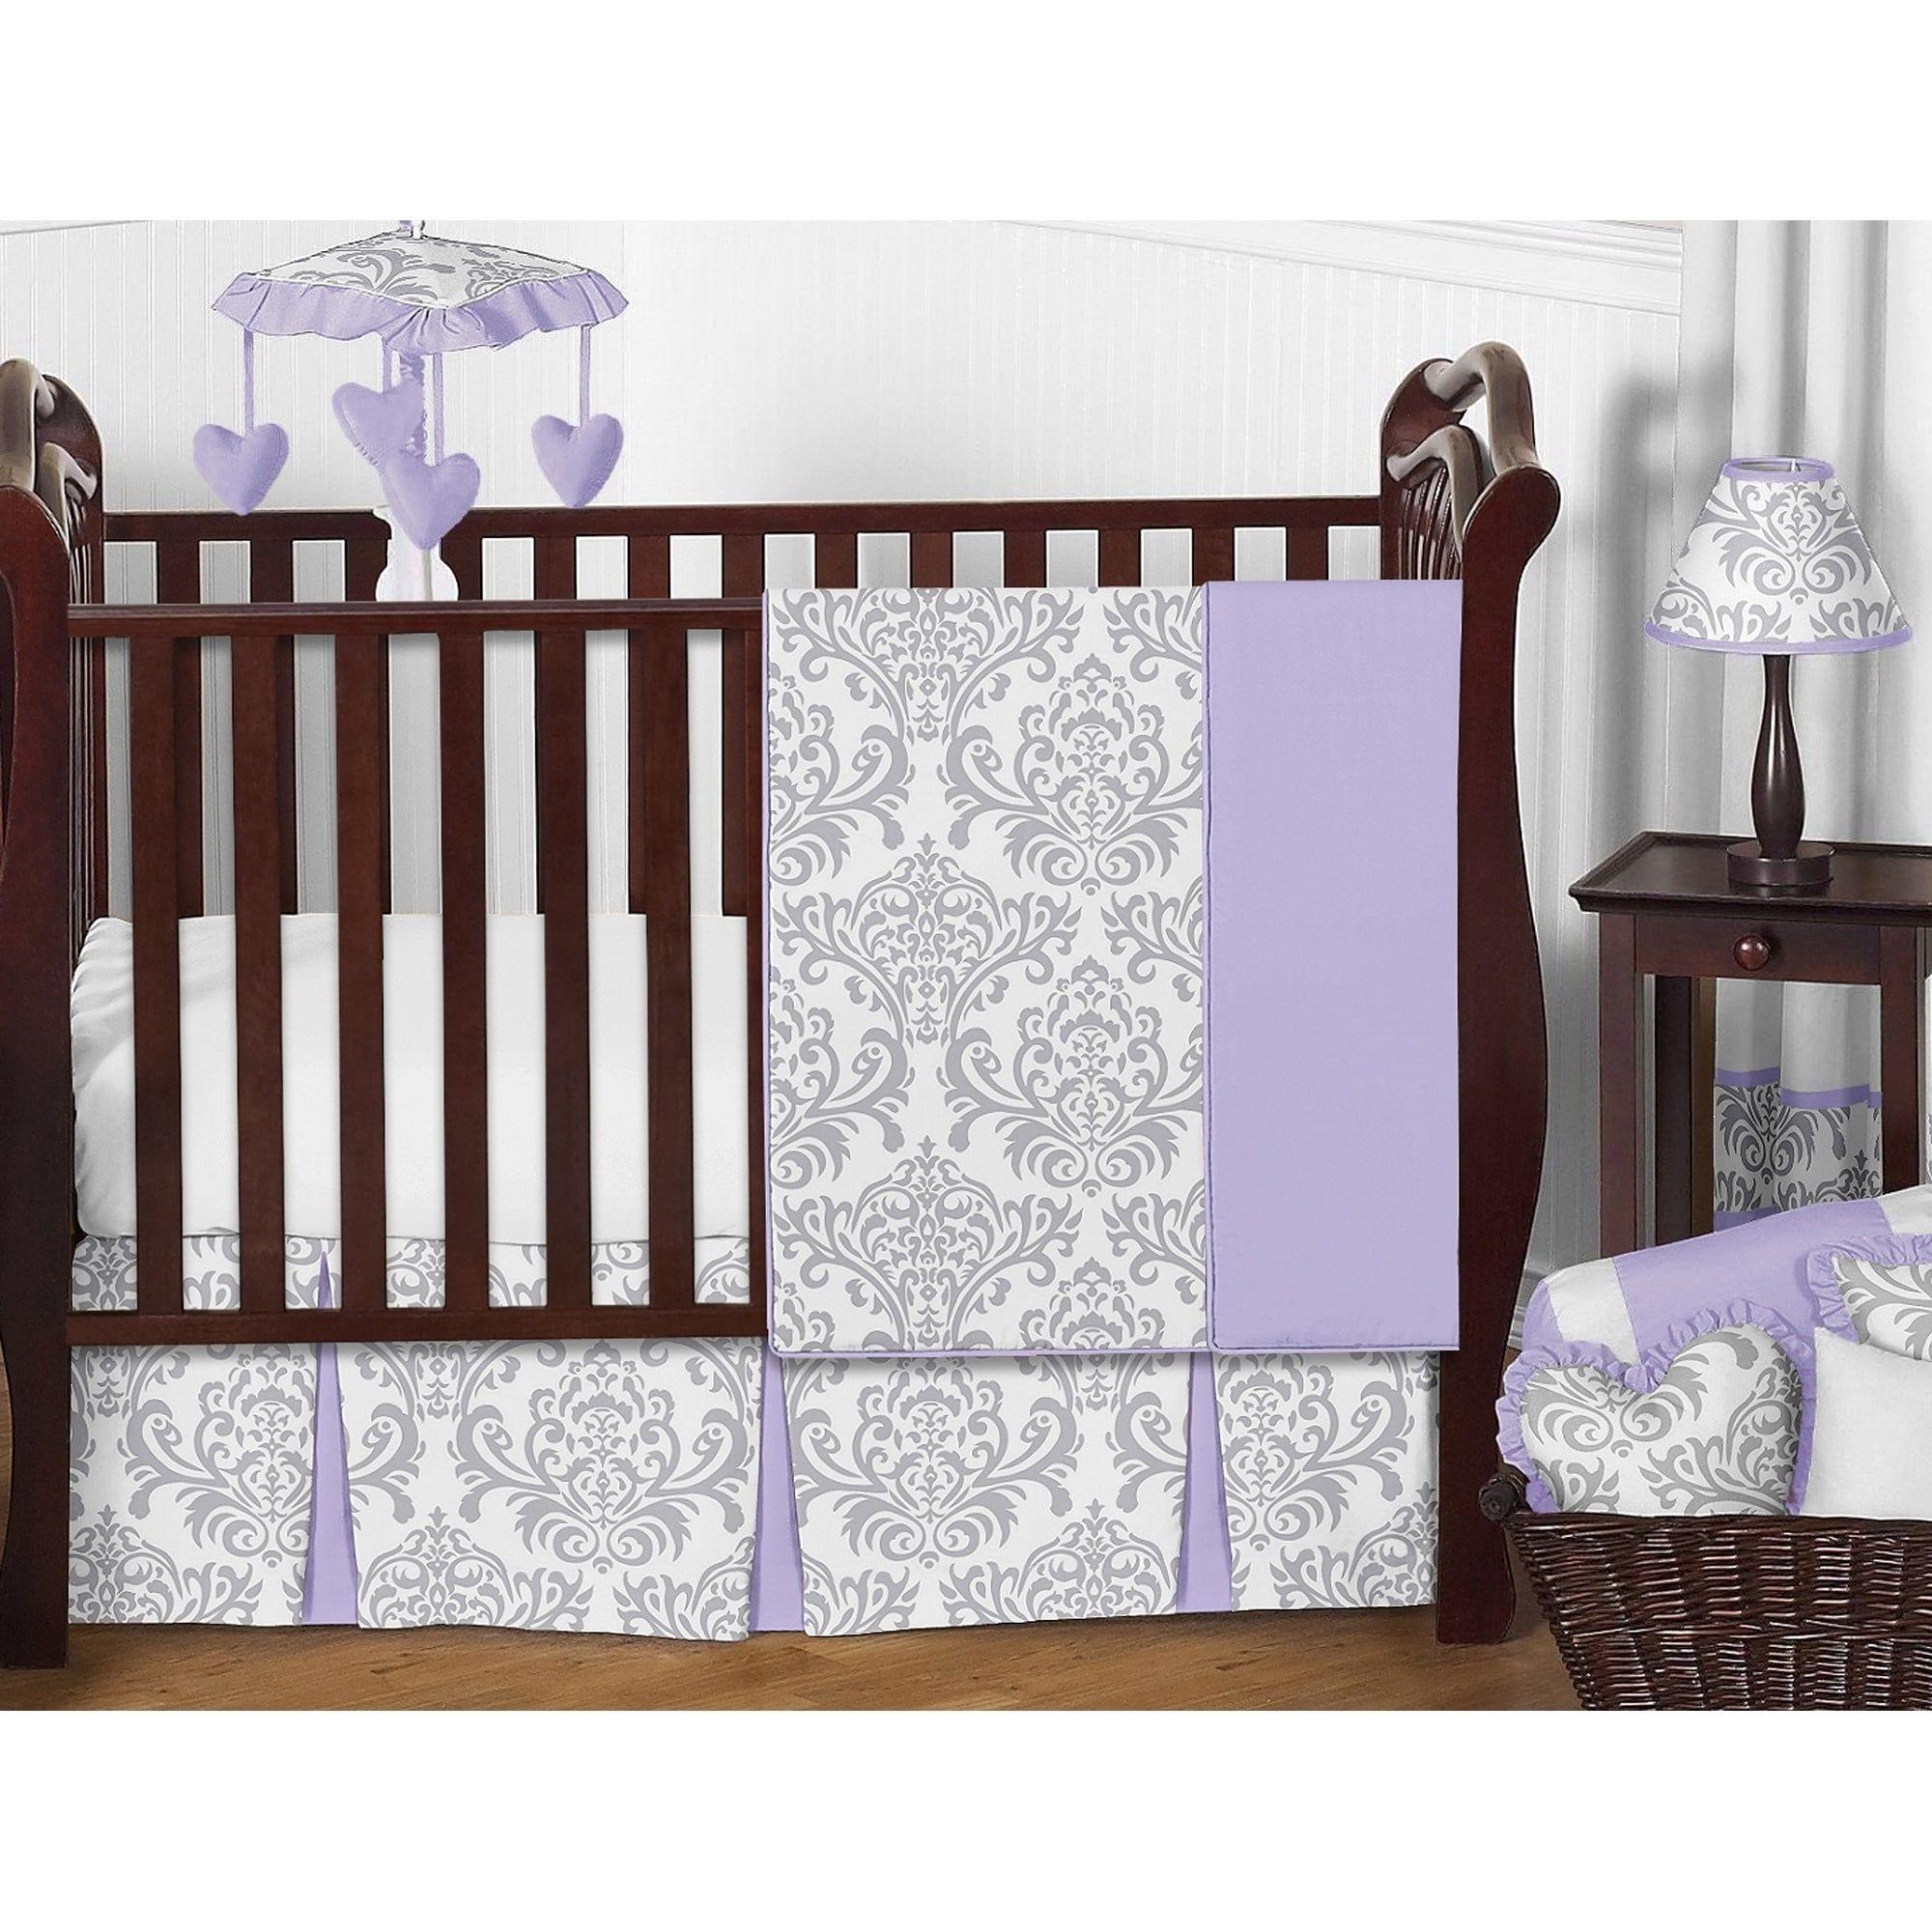 Sweet Jojo Designs Lavender Purple And Gray Elizabeth 11 Piece Bumperless Crib Bedding Set In Bumperless Crib Bedding Crib Bedding Girl Girl Crib Bedding Sets